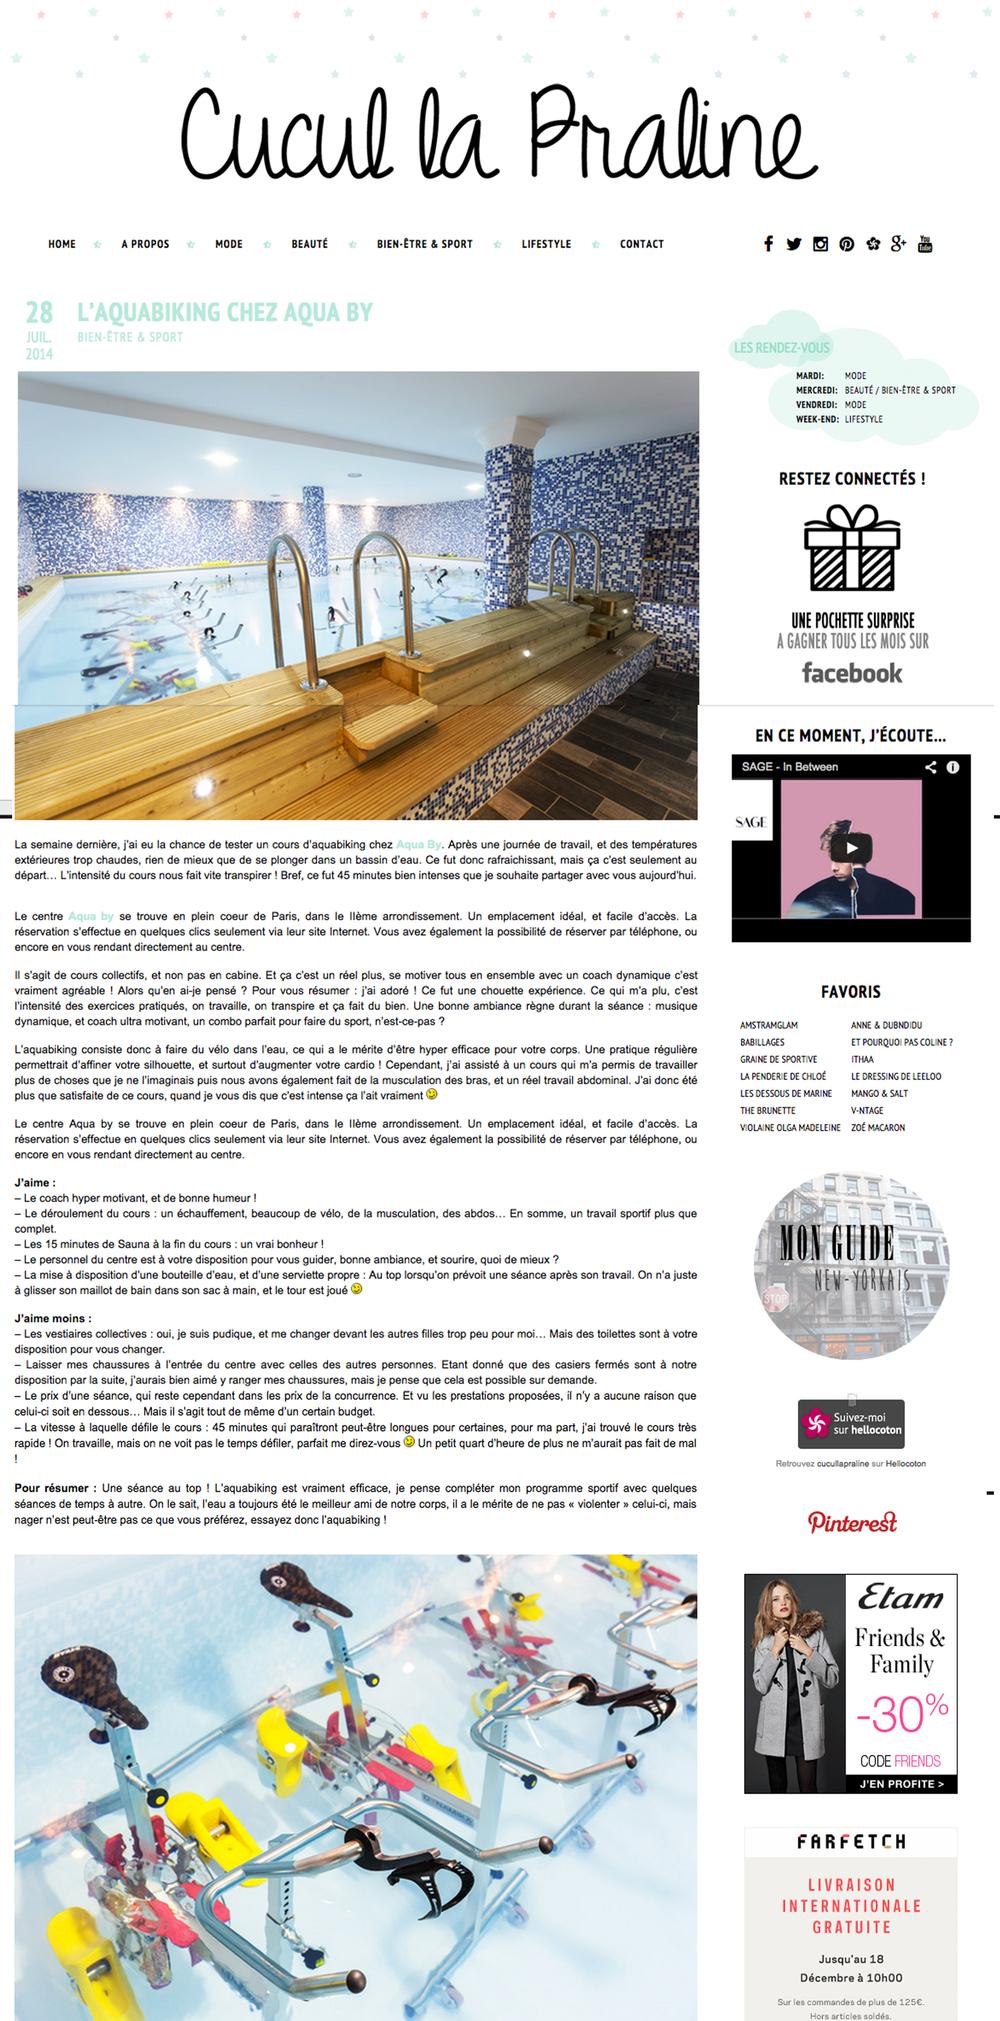 Cucul la Praline teste Aqua by